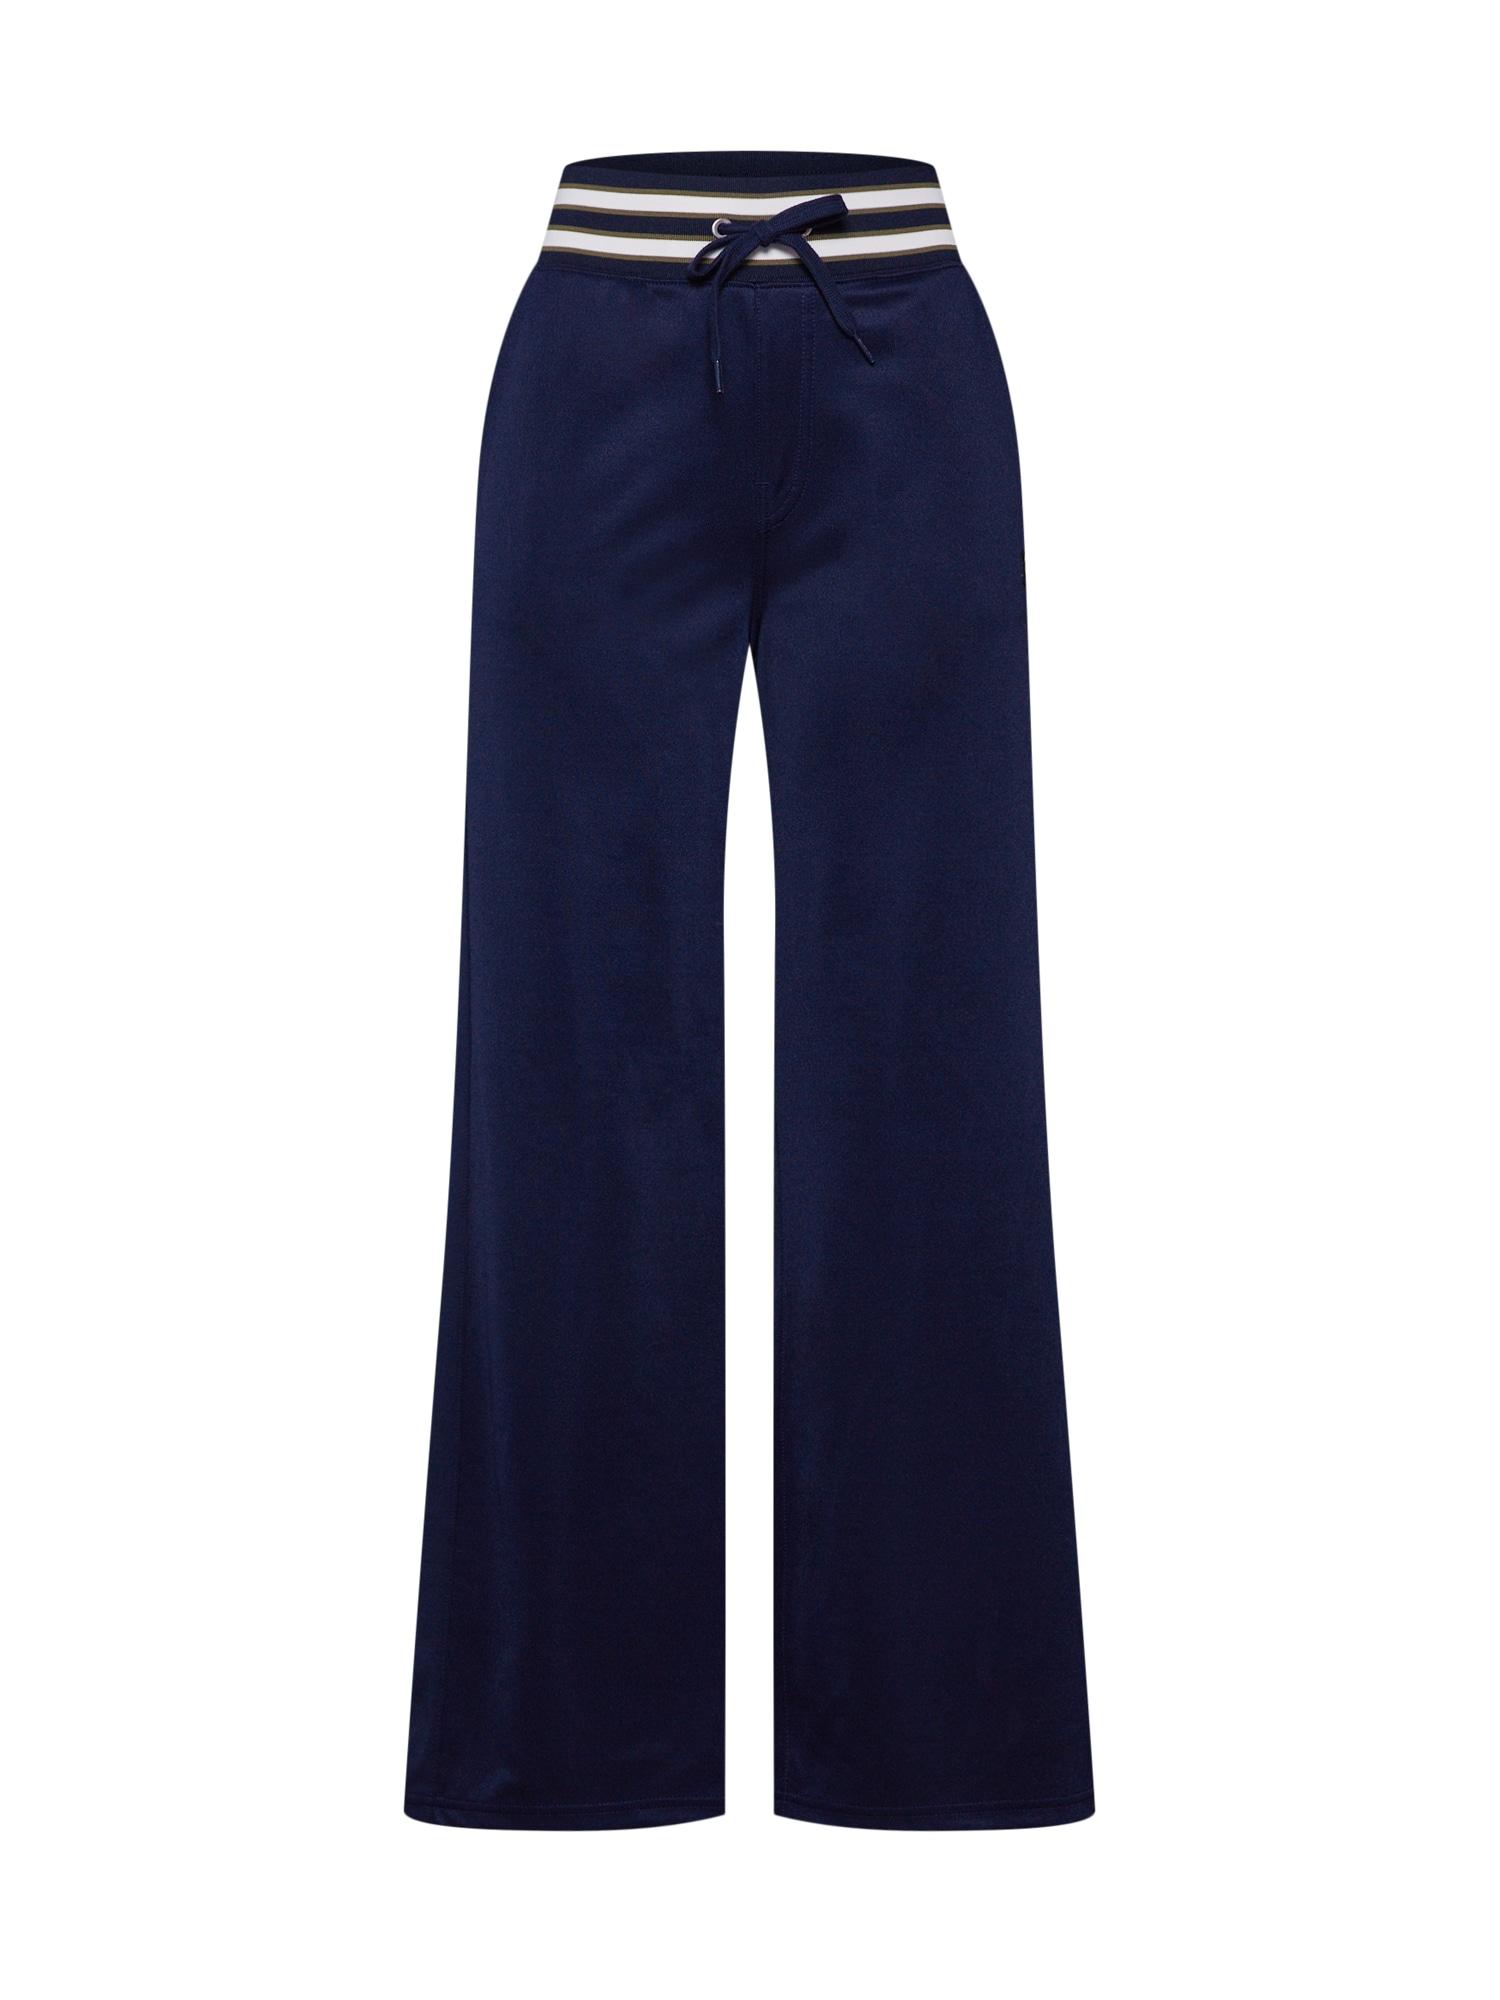 Kalhoty Lucay wide track pant wmn modrá G-STAR RAW